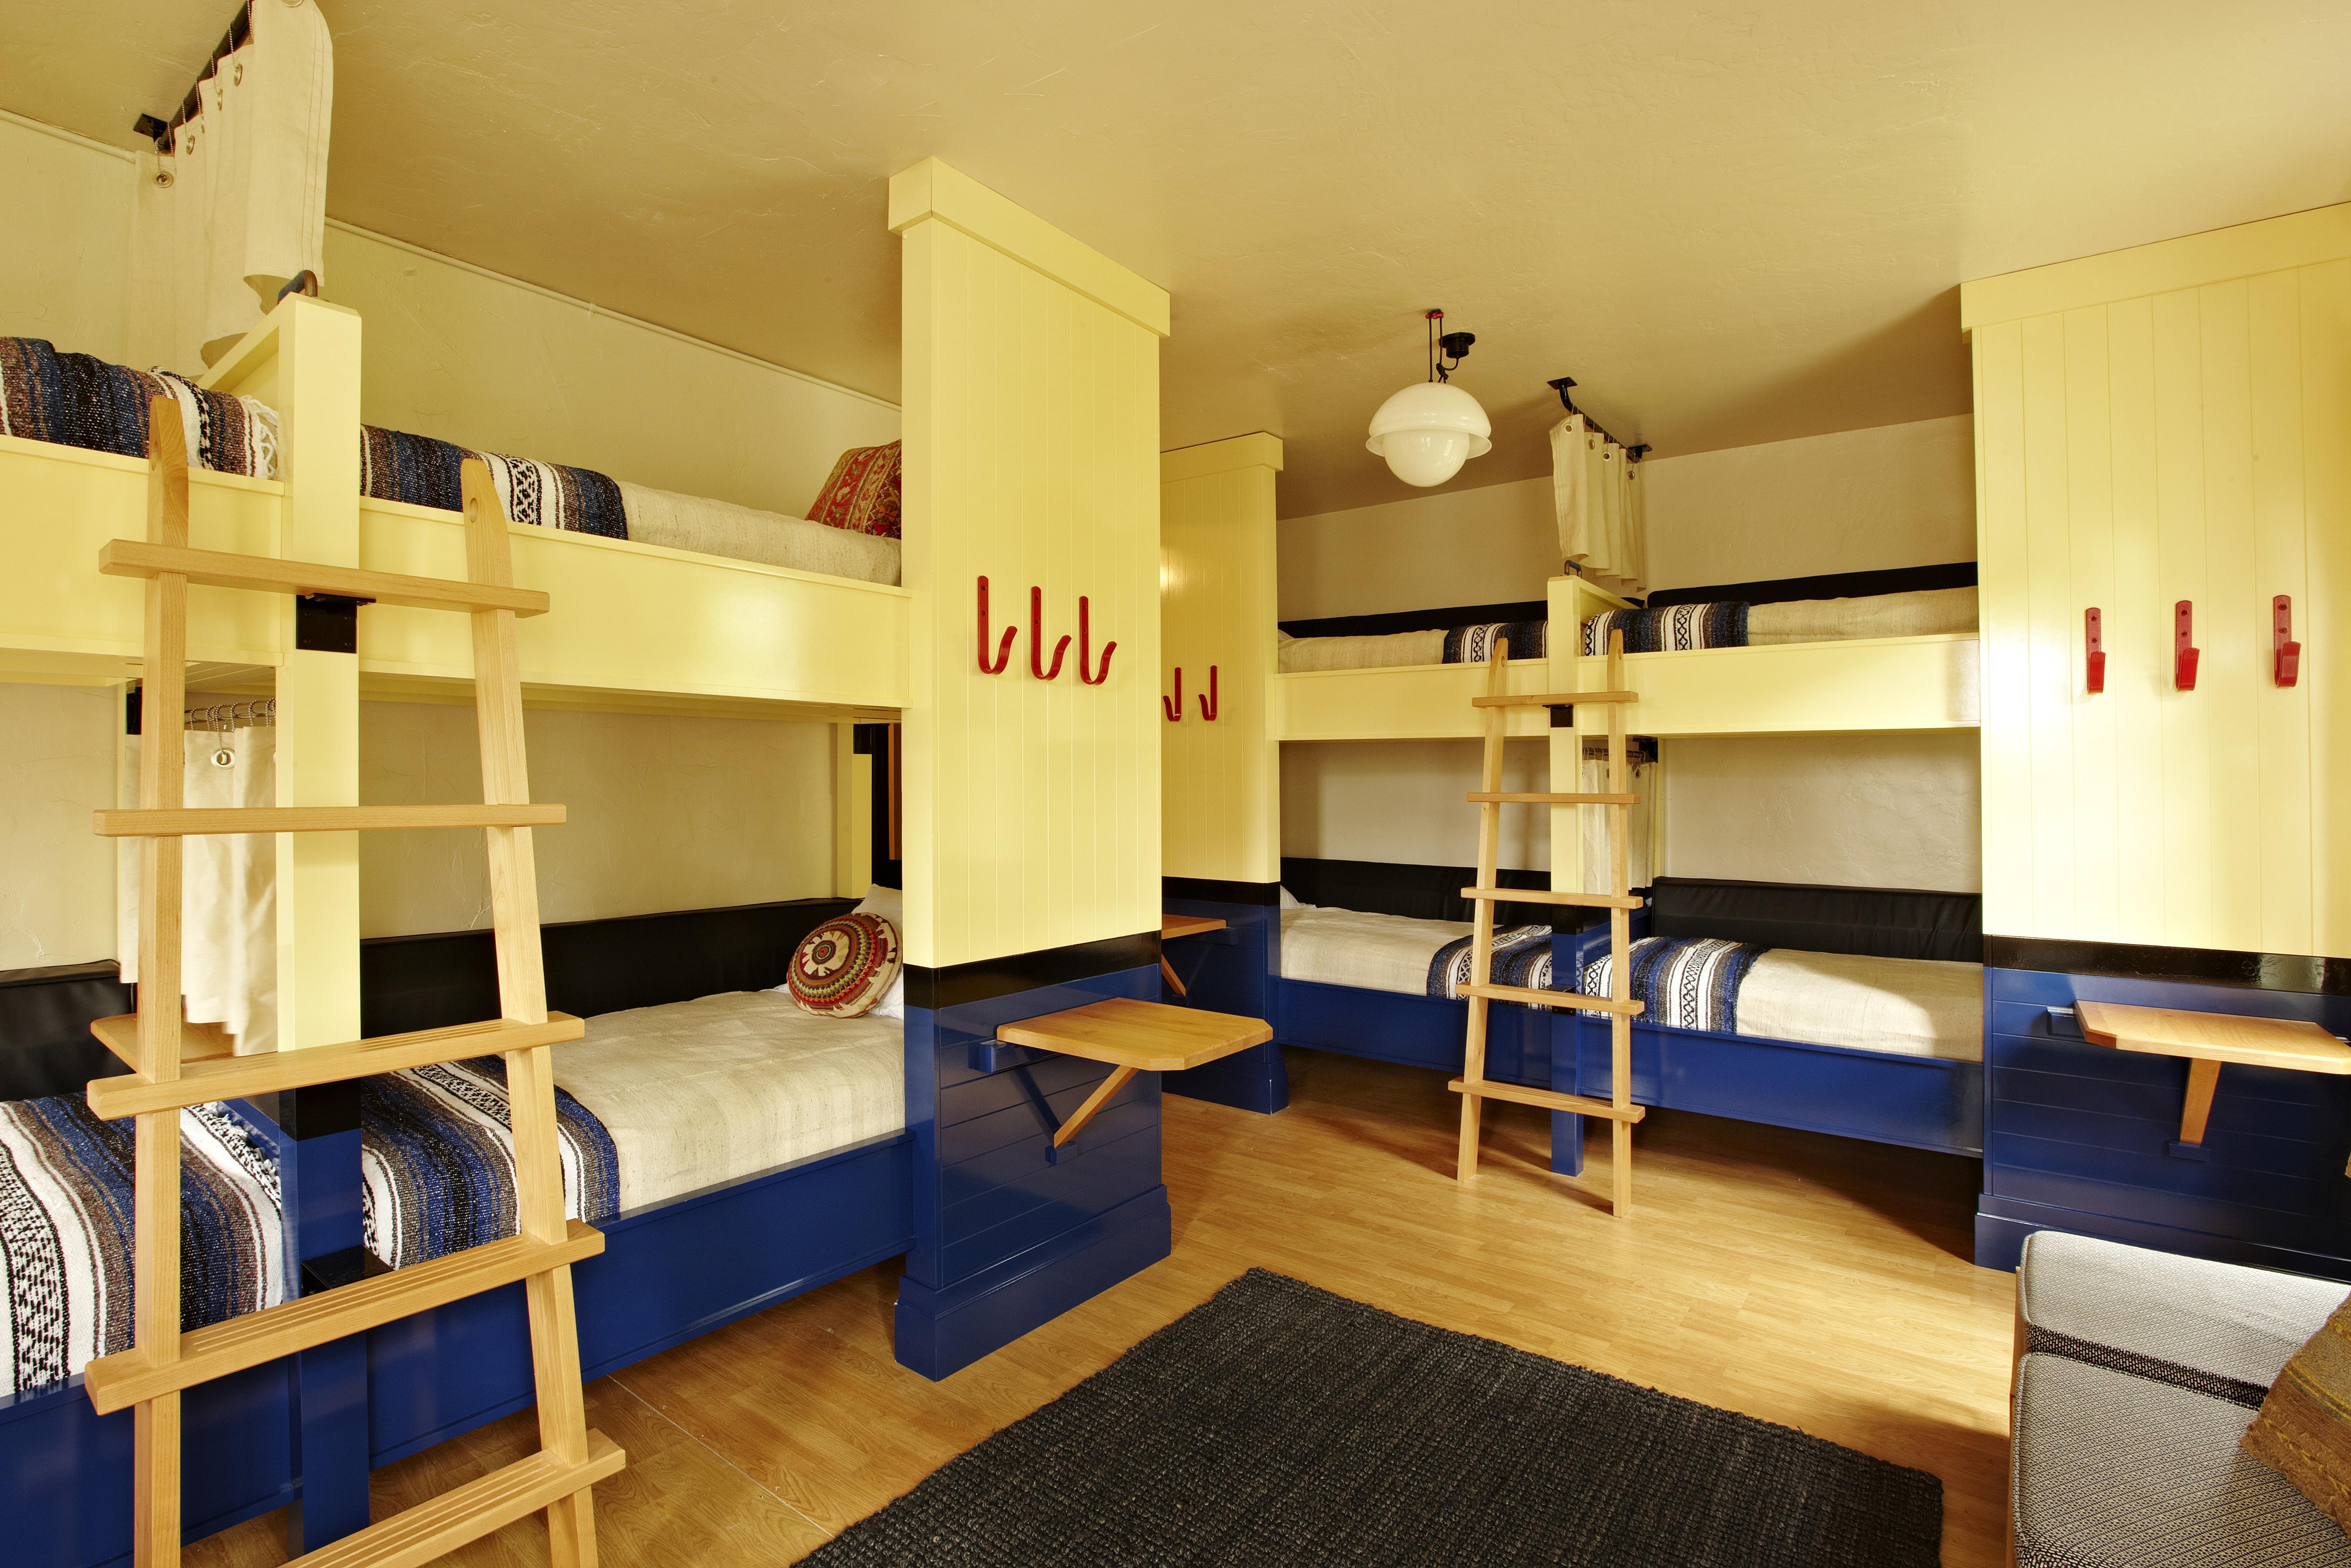 Ryans air adventures freehand miami hostel photos for Room decor ideas in hostel